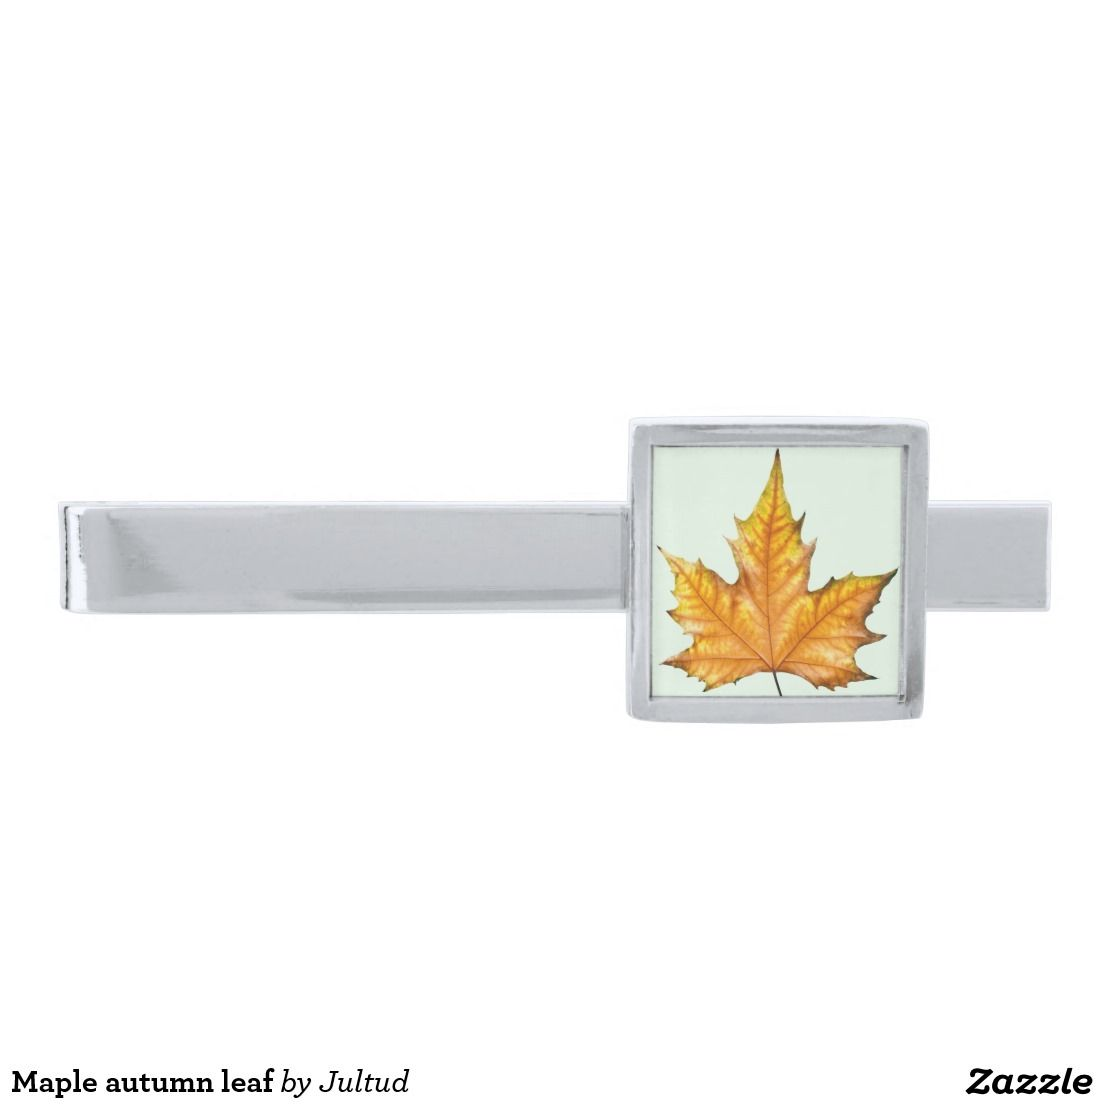 Maple autumn leaf tie clip. #tieclips #maple #leaf #photograph #elegant #menswear